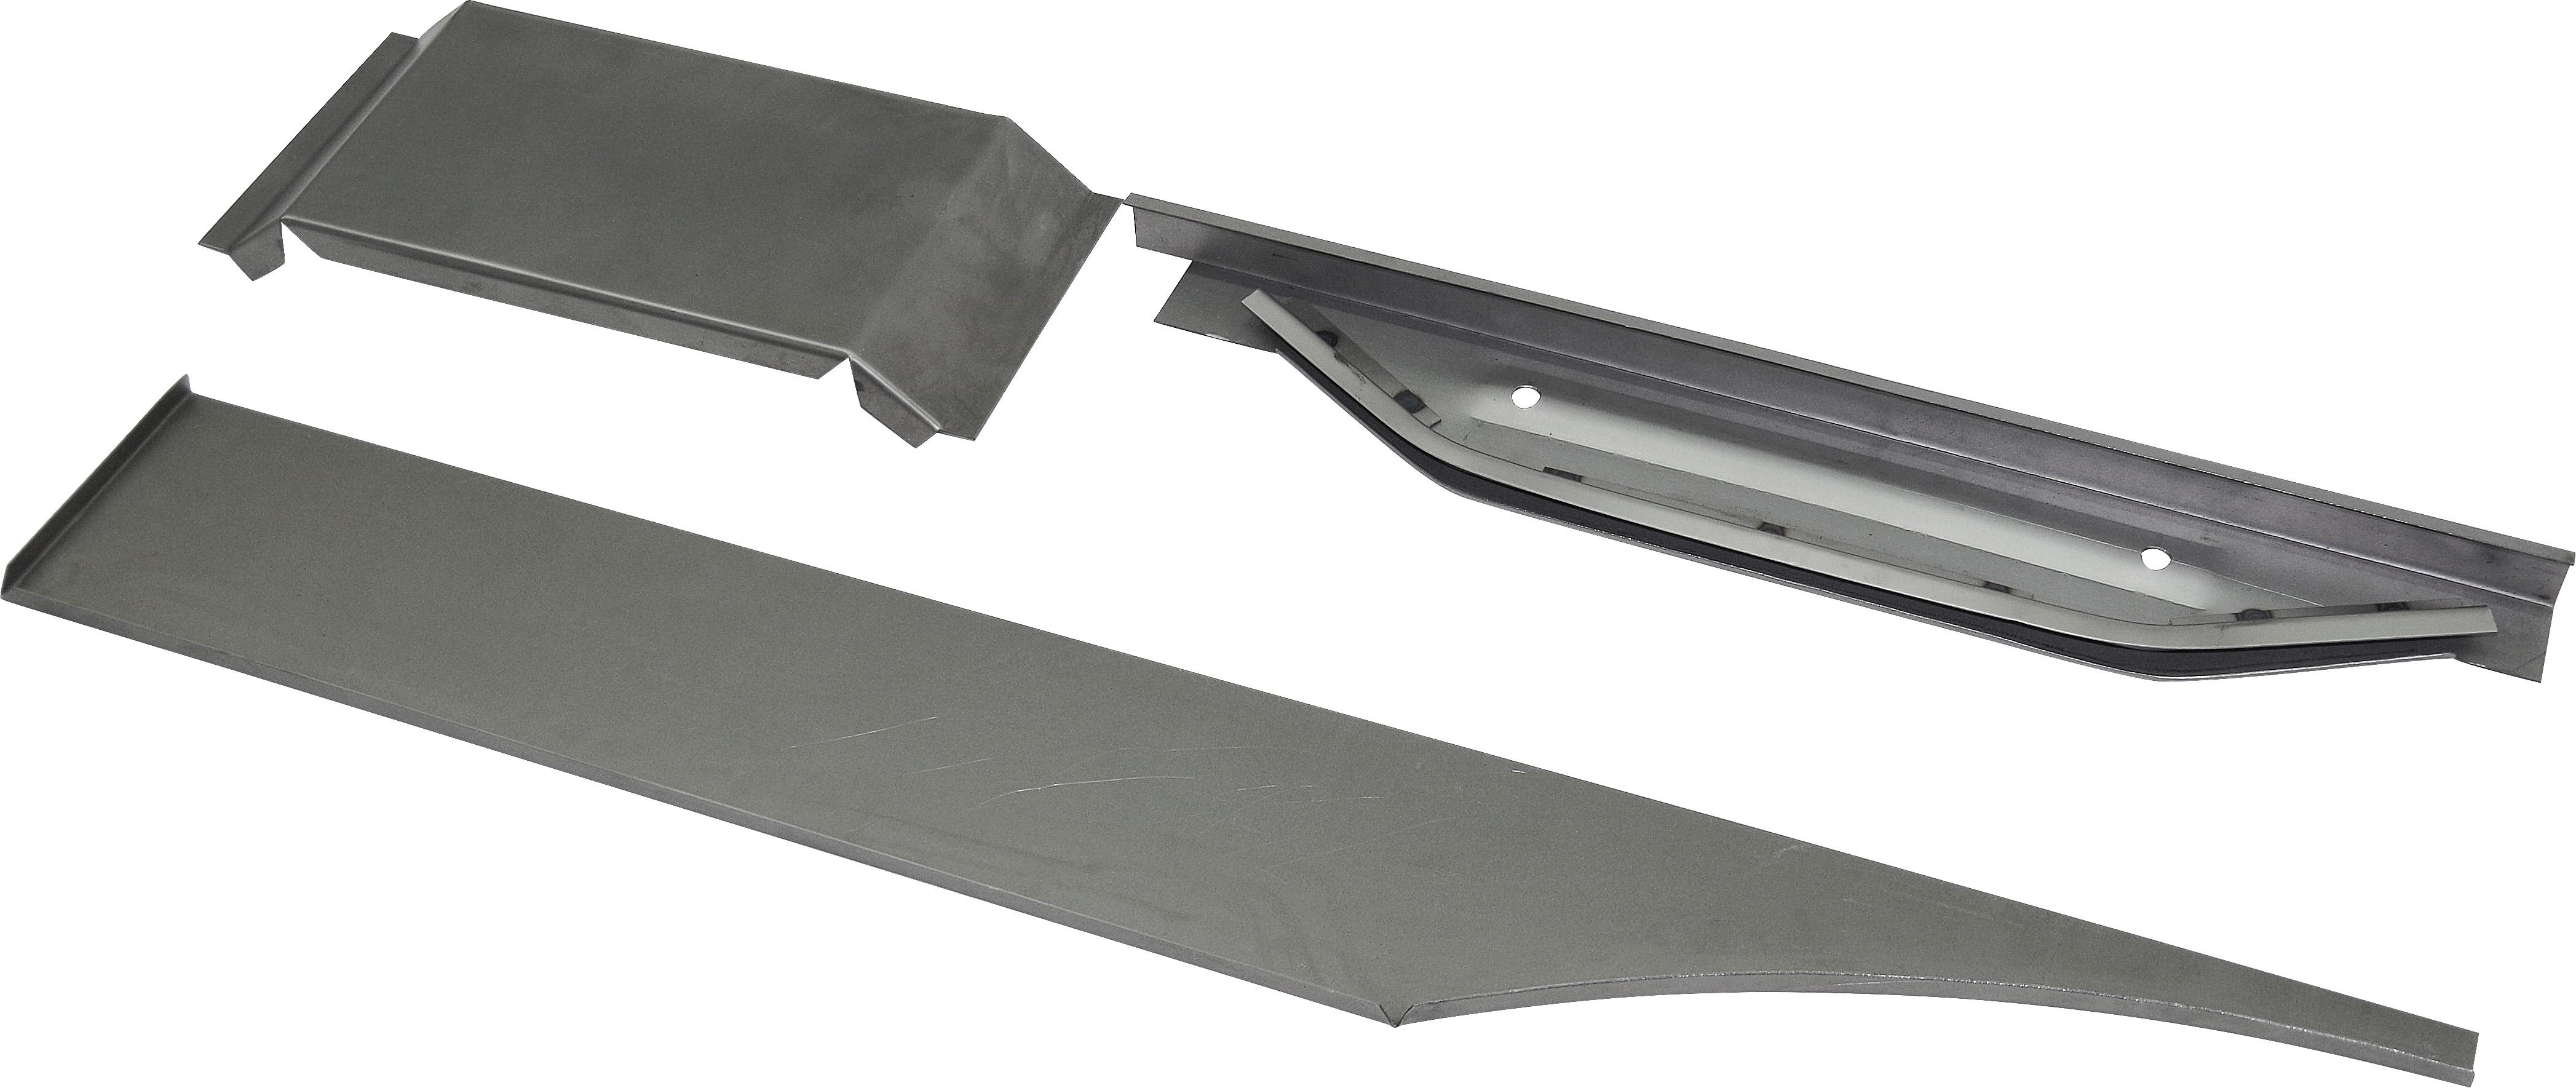 Unimog Reparaturblech Tür rechts U403-U406-U416-U417-U421